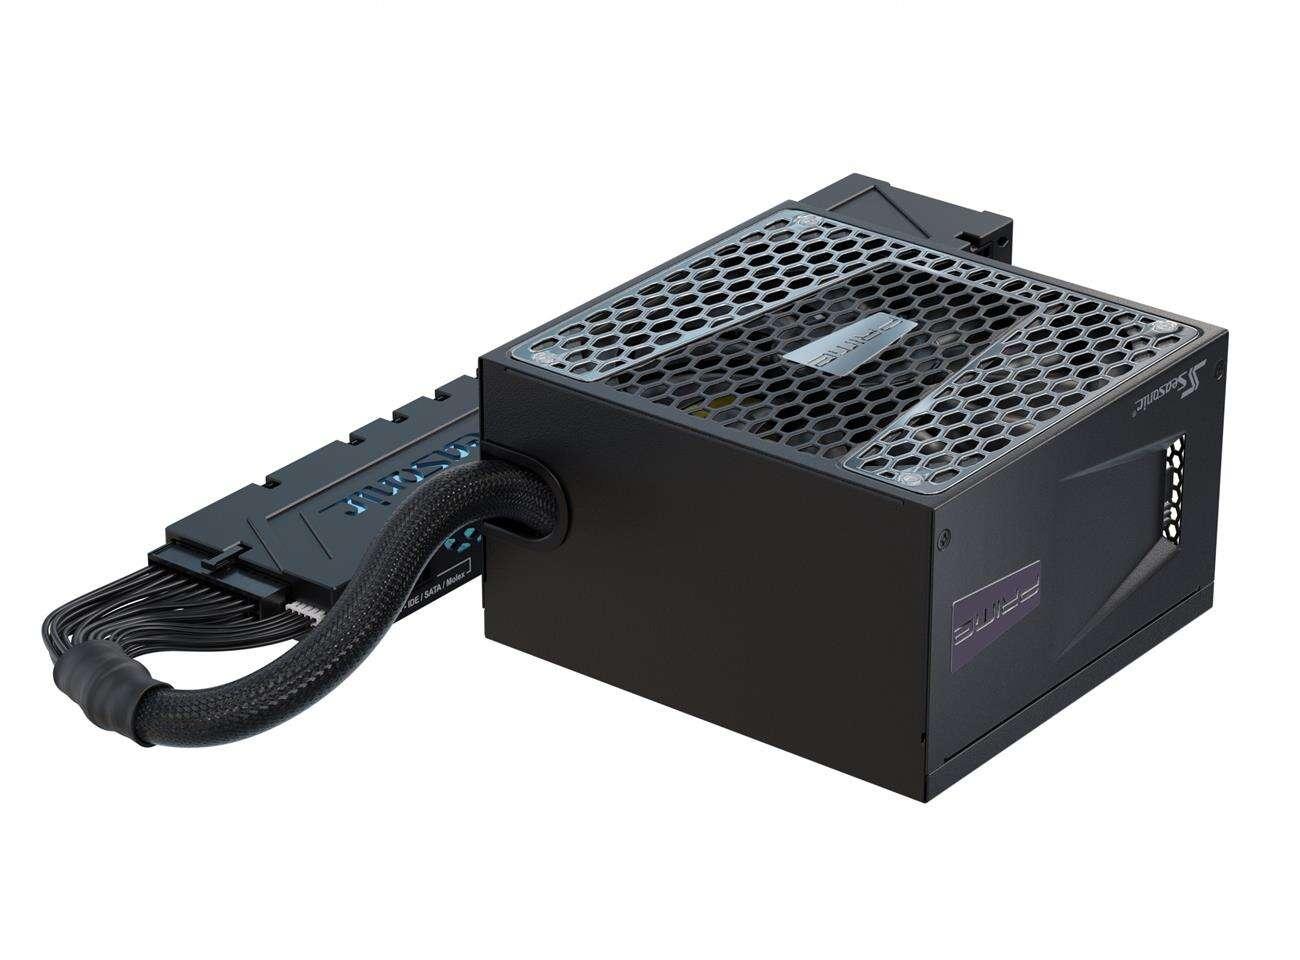 test Seasonic Connect 750, recenzja Seasonic Connect 750, review Seasonic Connect 750, opinia Seasonic Connect 750, cena Seasonic Connect 750